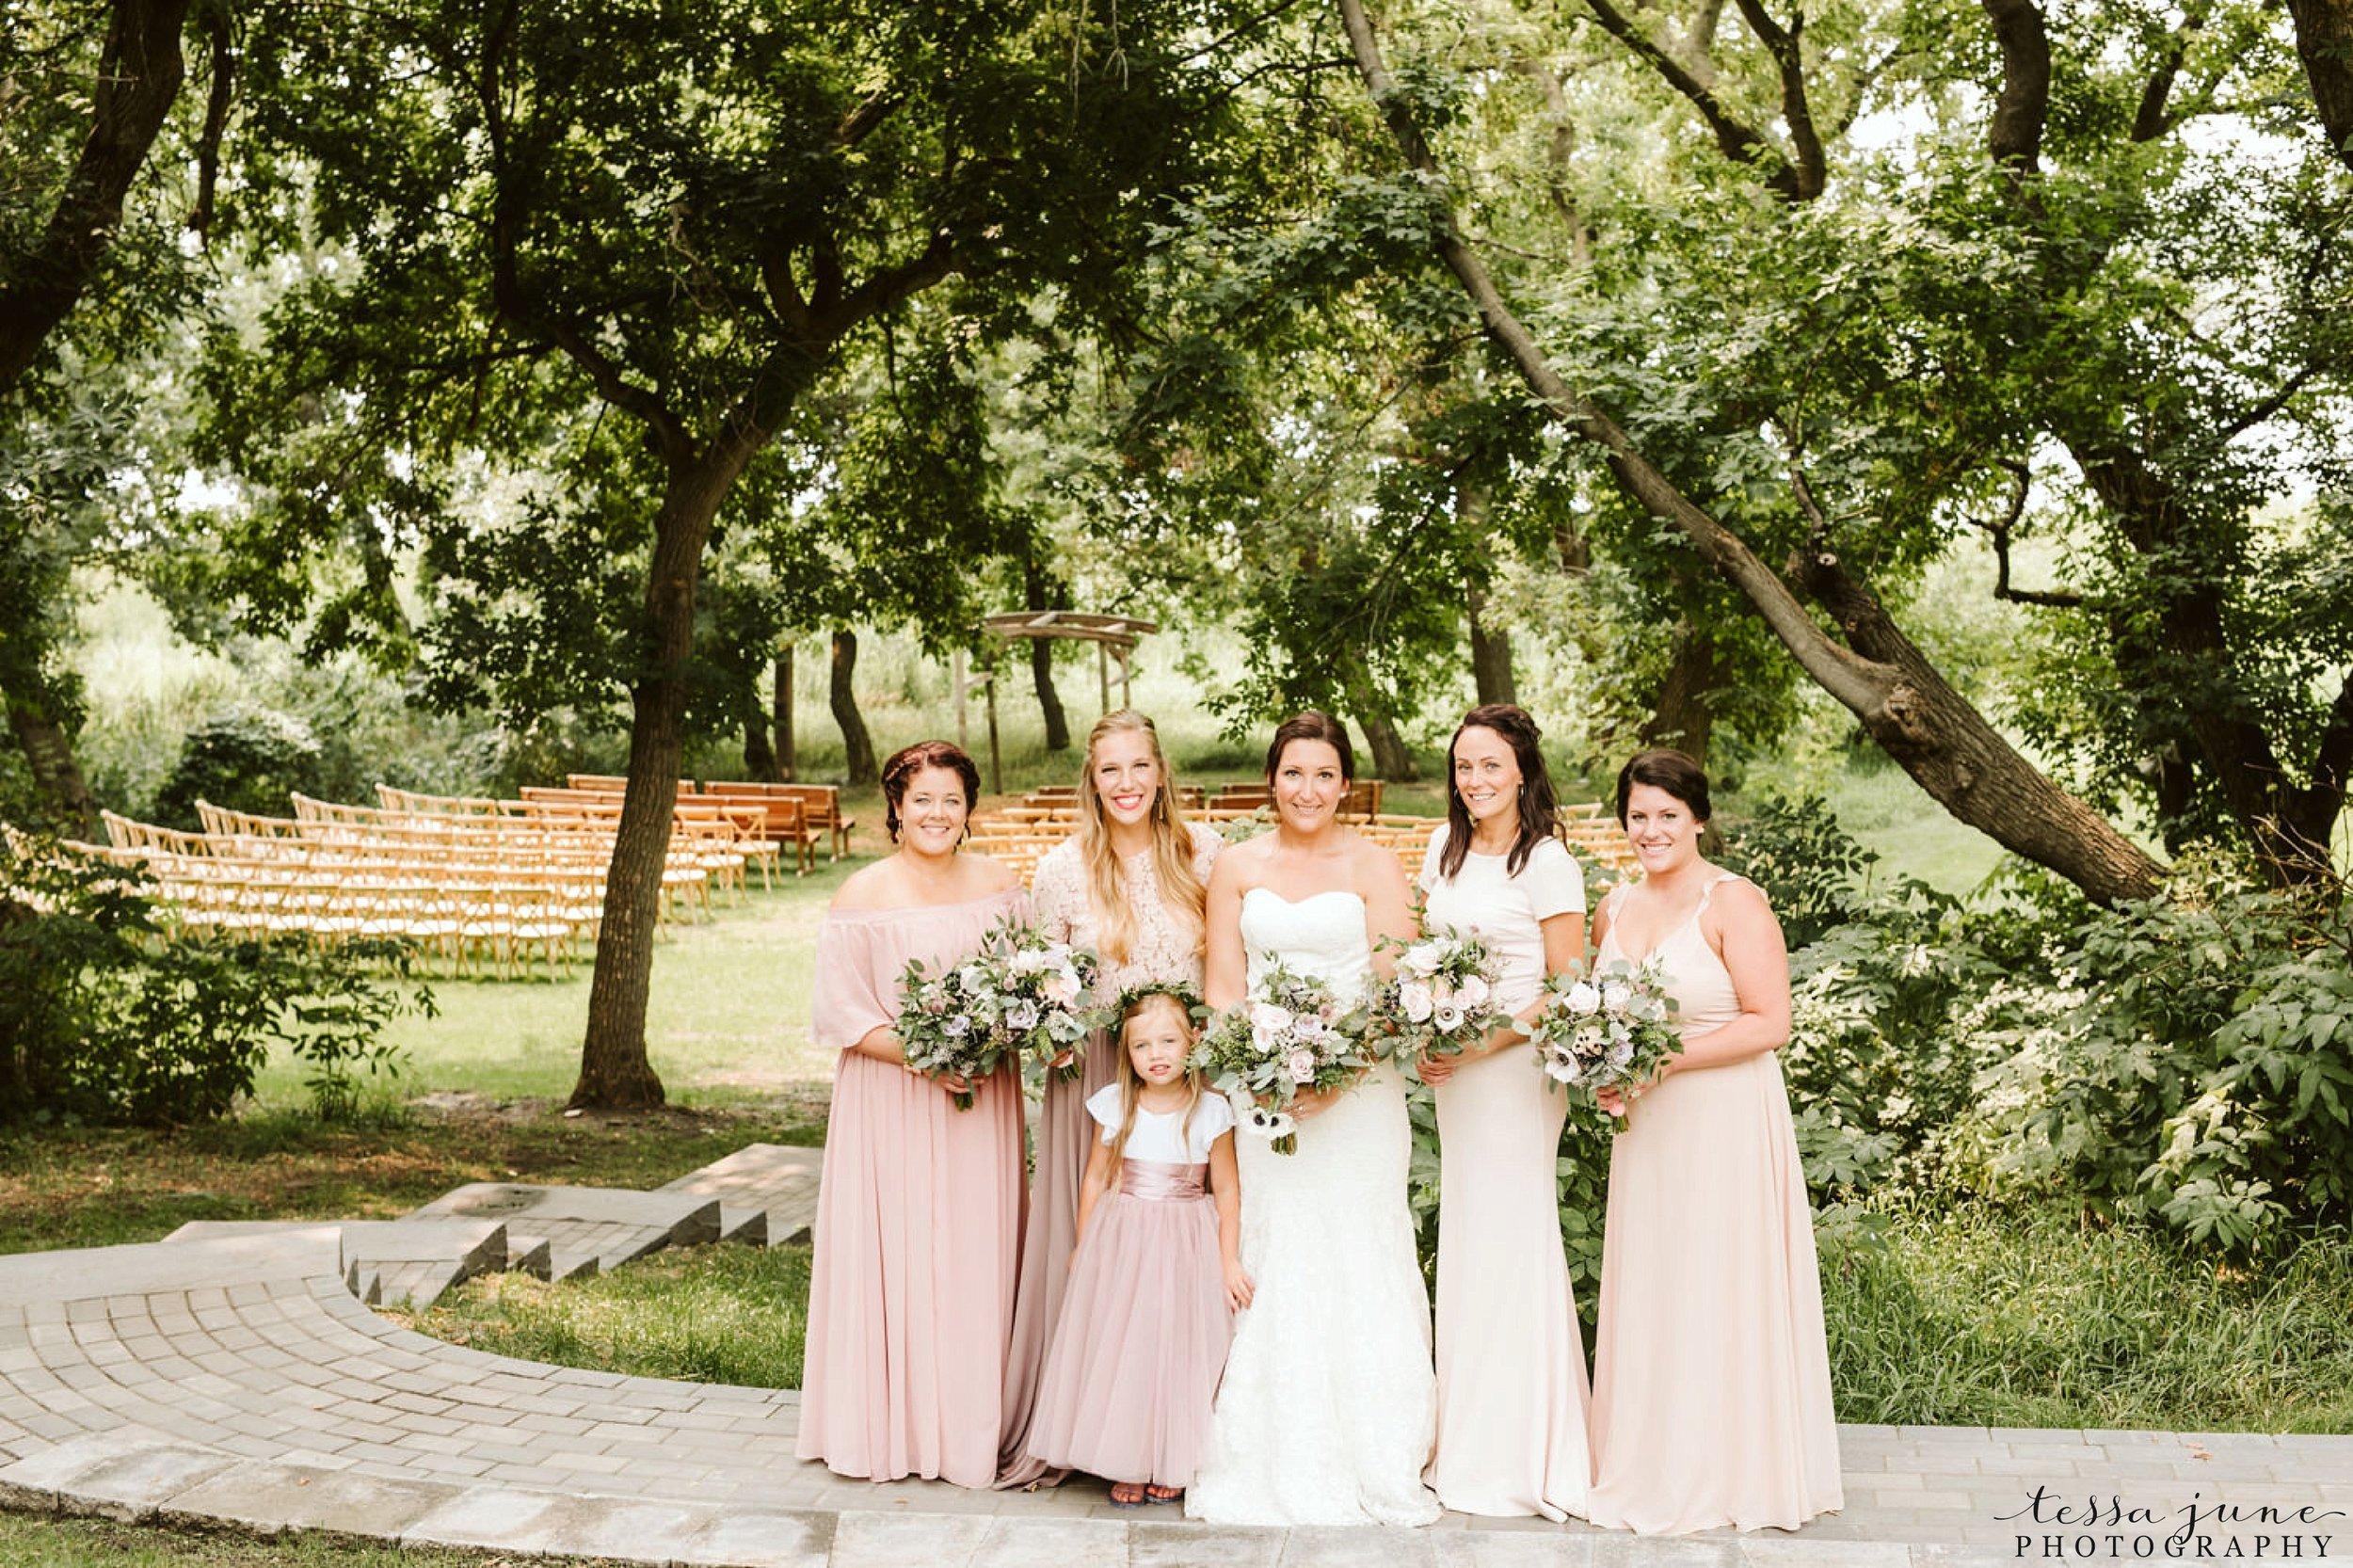 gathered-oaks-barn-wedding-alexandria-minnesota-7.jpg